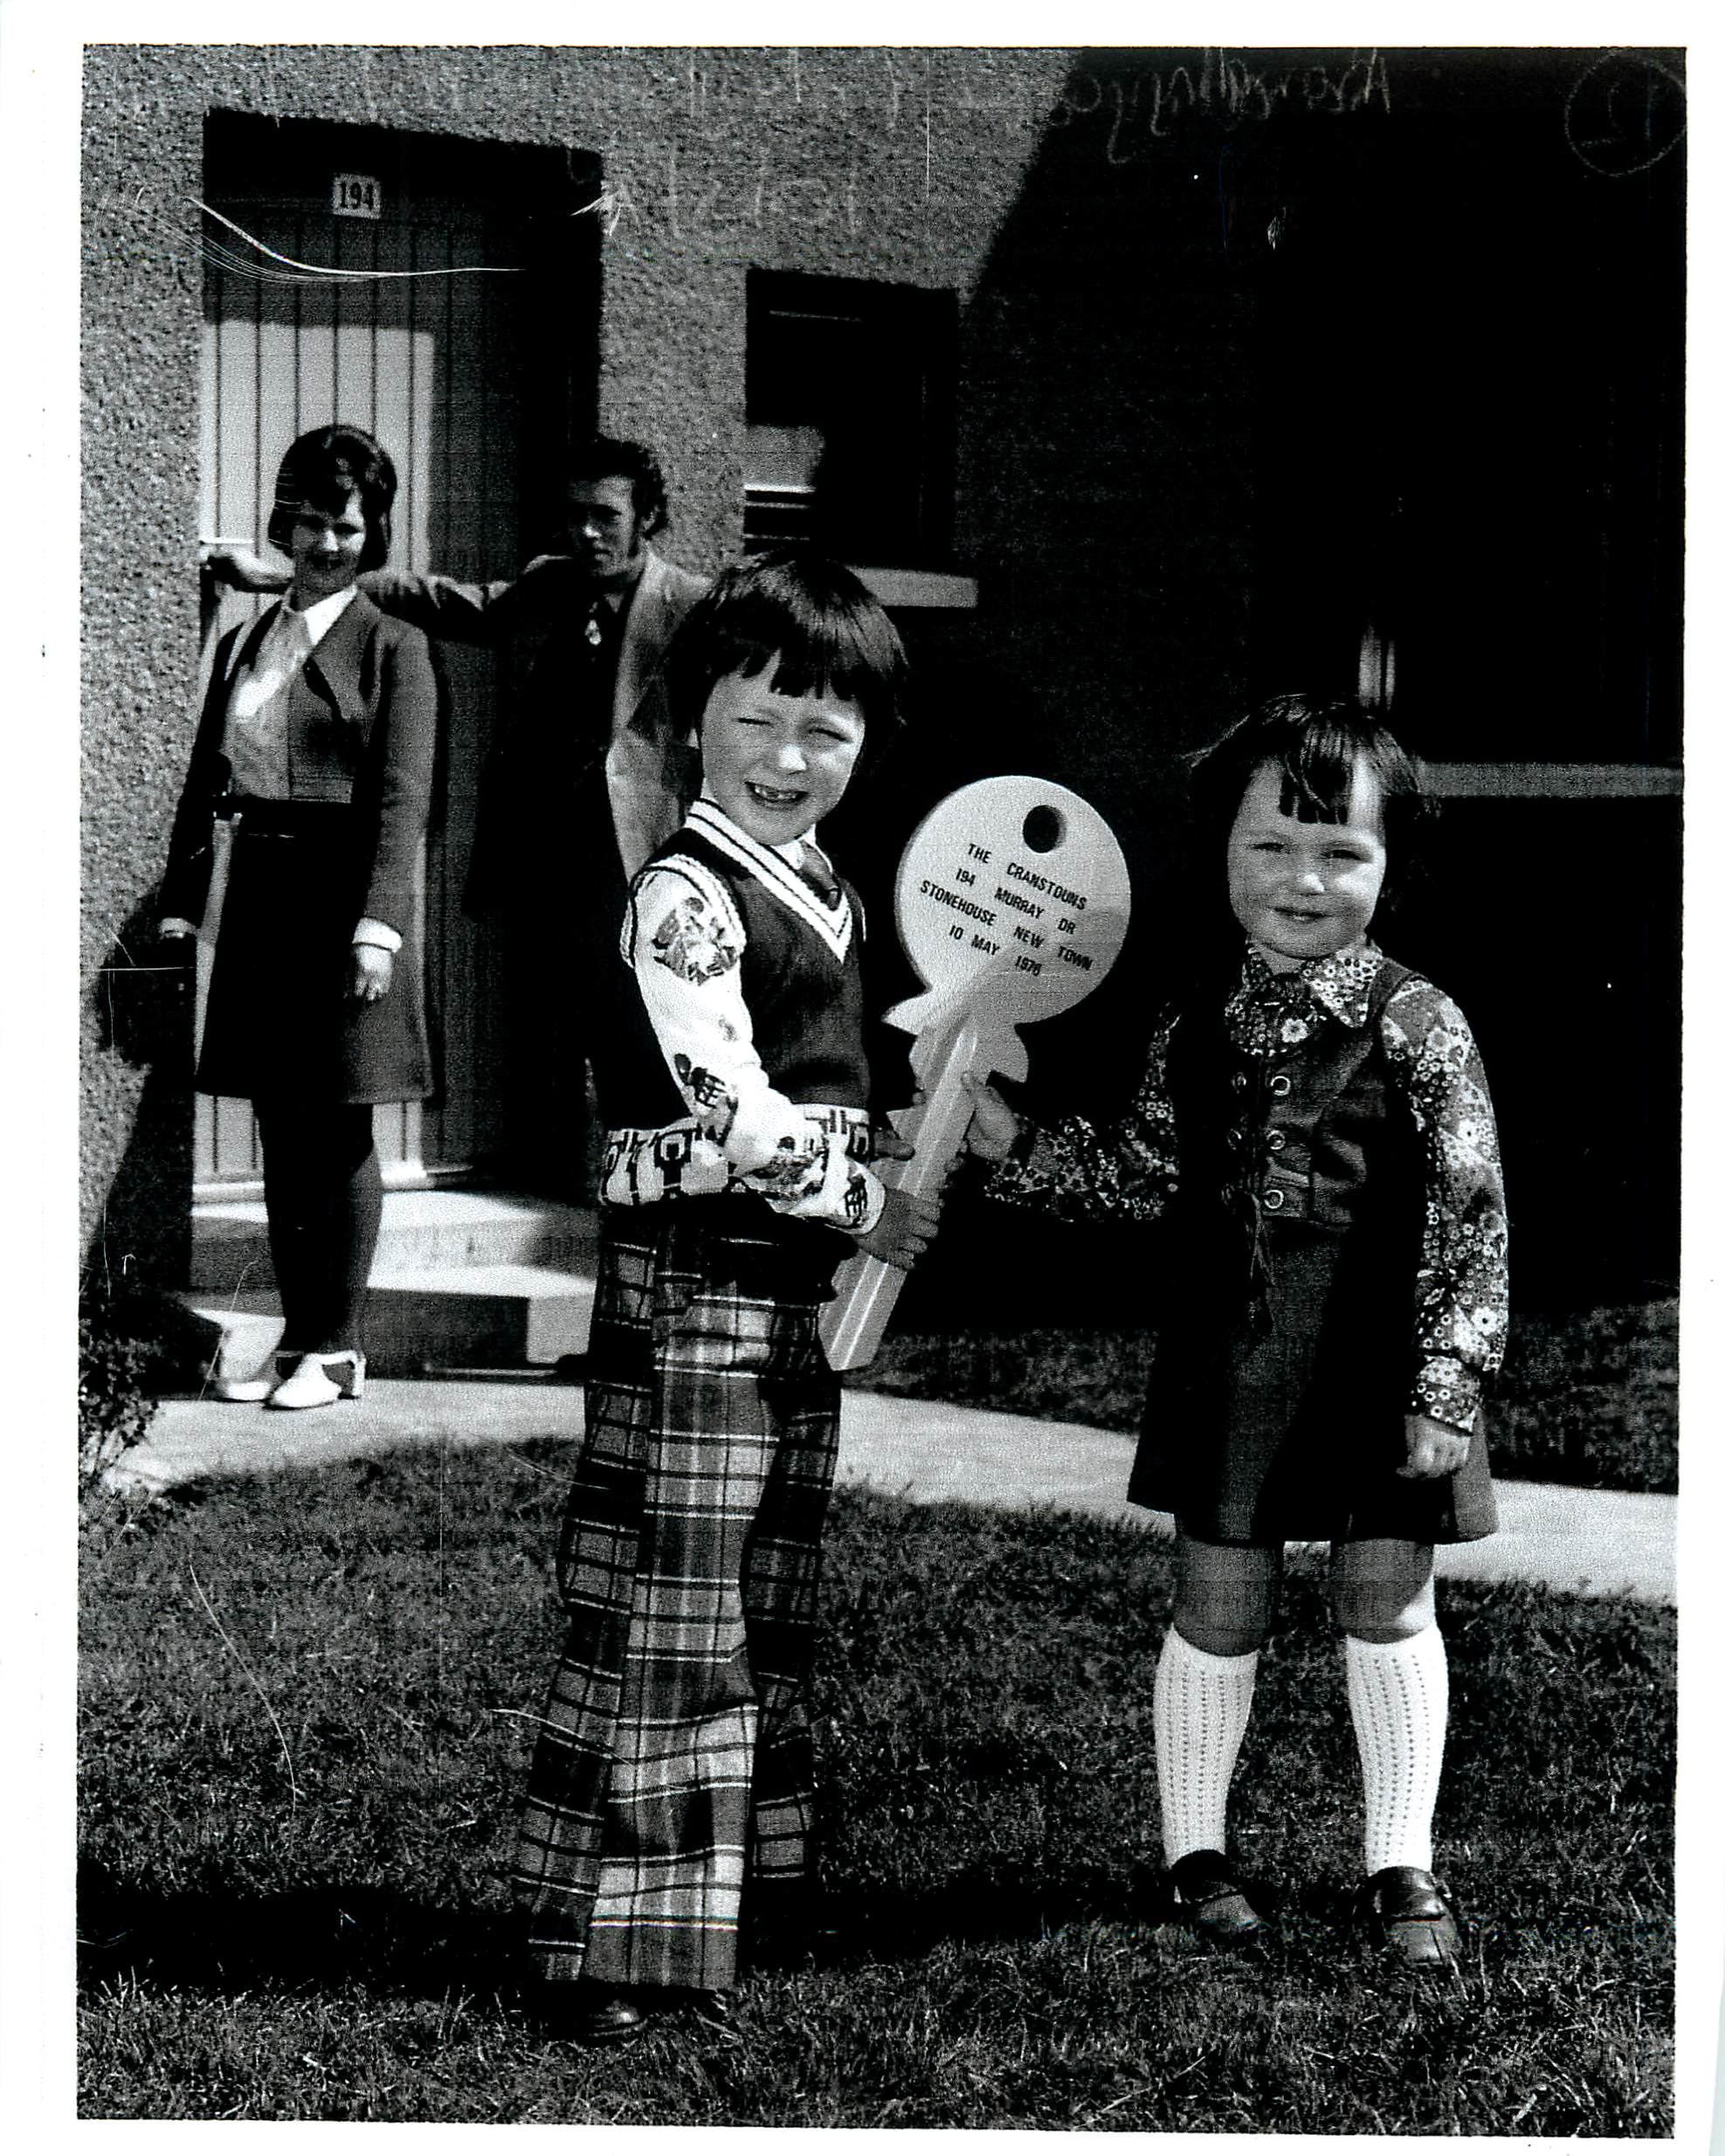 cranstons 194 murray drive 10th may 1976